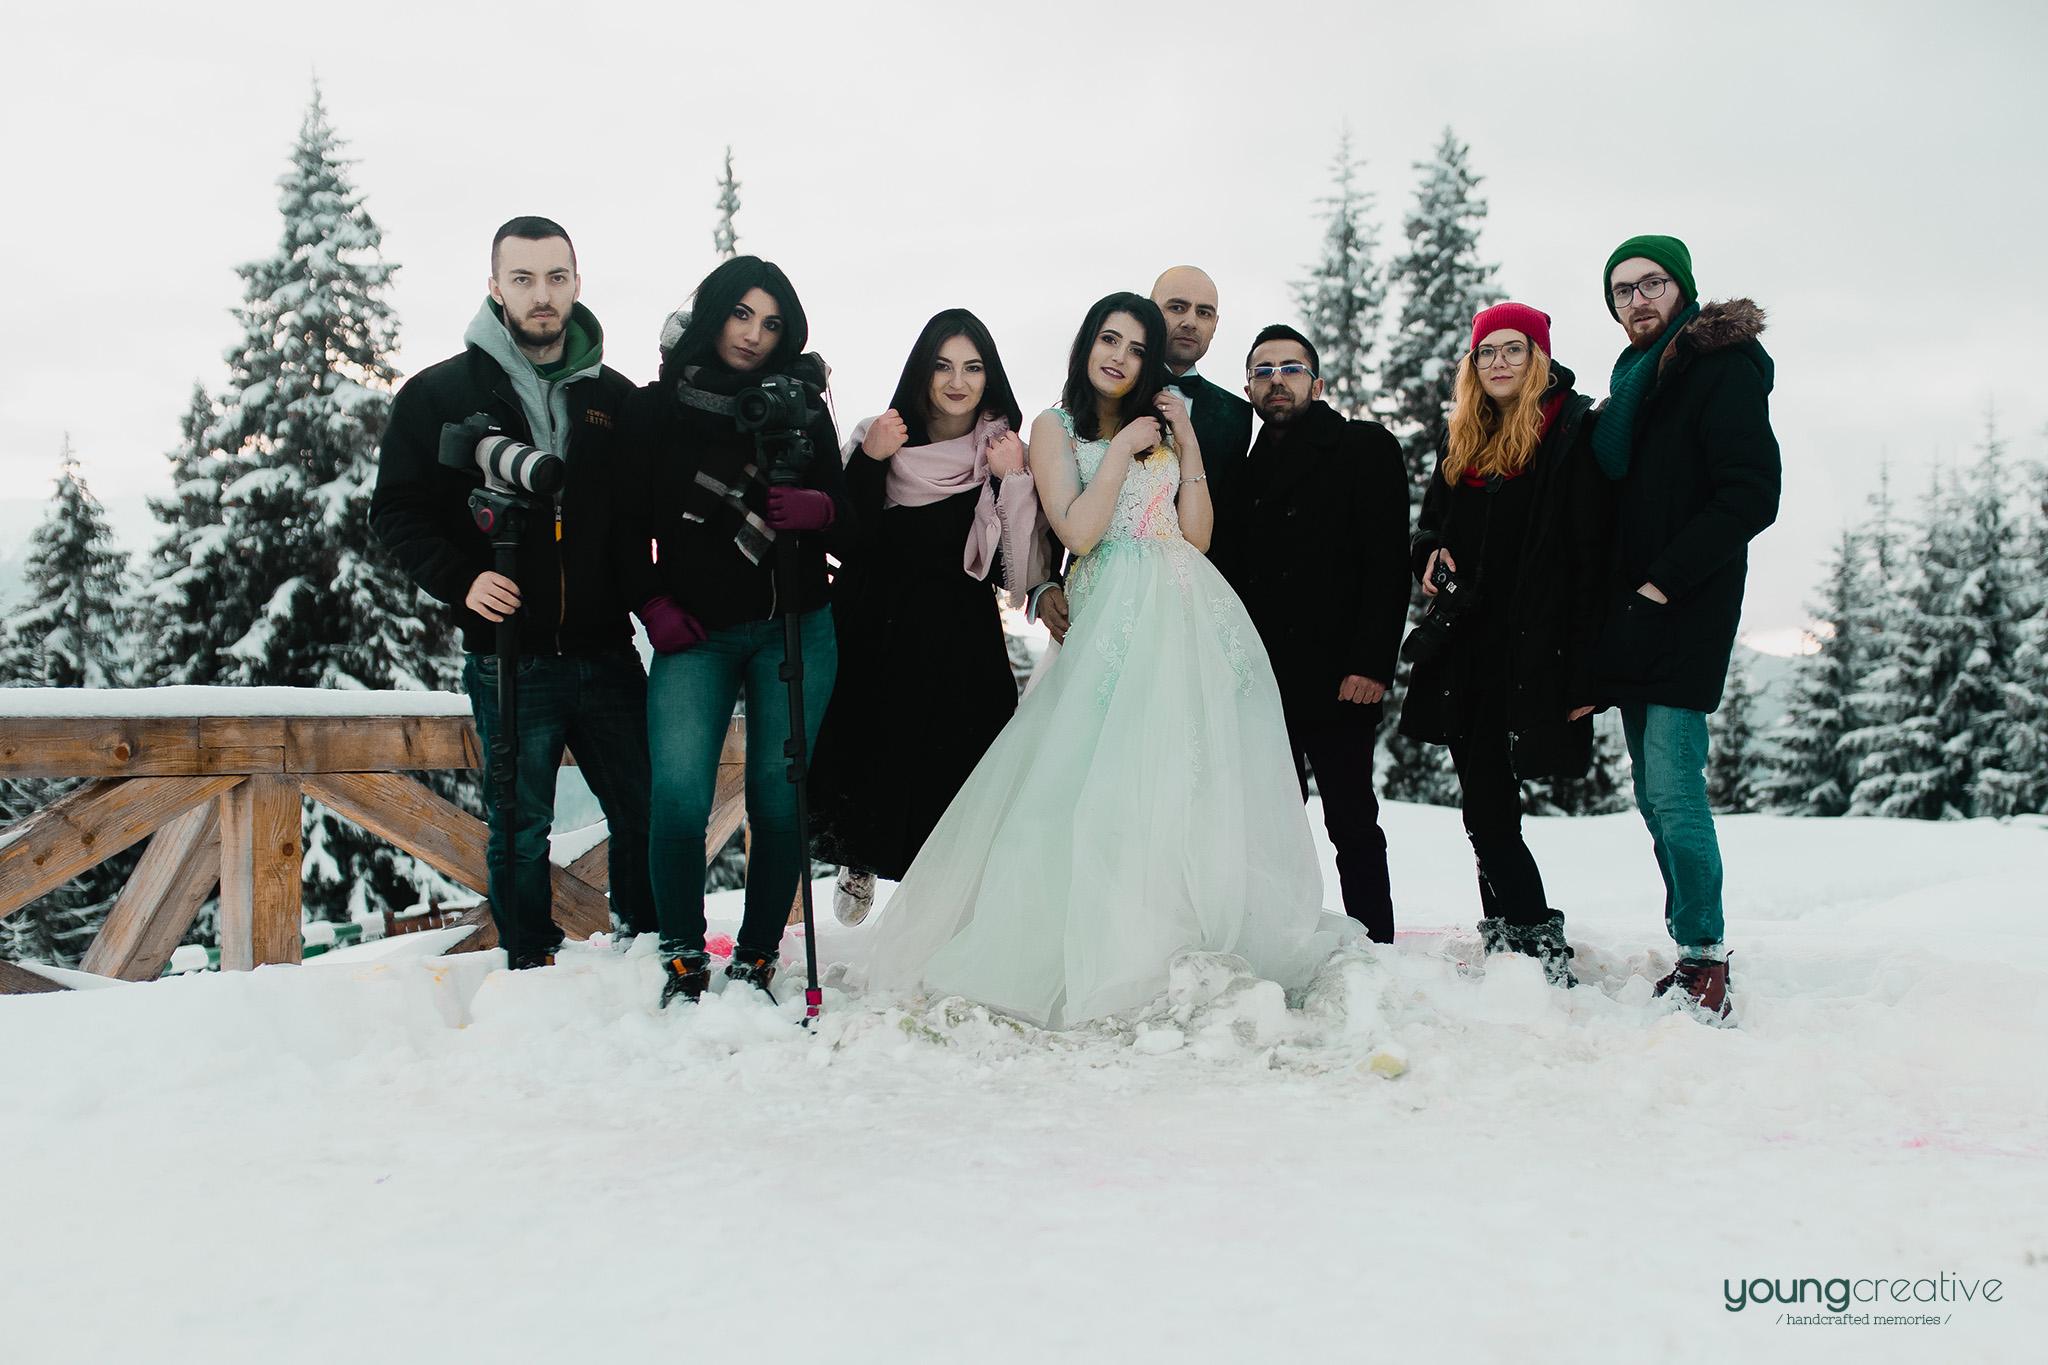 Trash the dress / Beta & Fanu / Filipciuc Dan & Cristina Bejan / fotograf Iasi / youngcreative.info